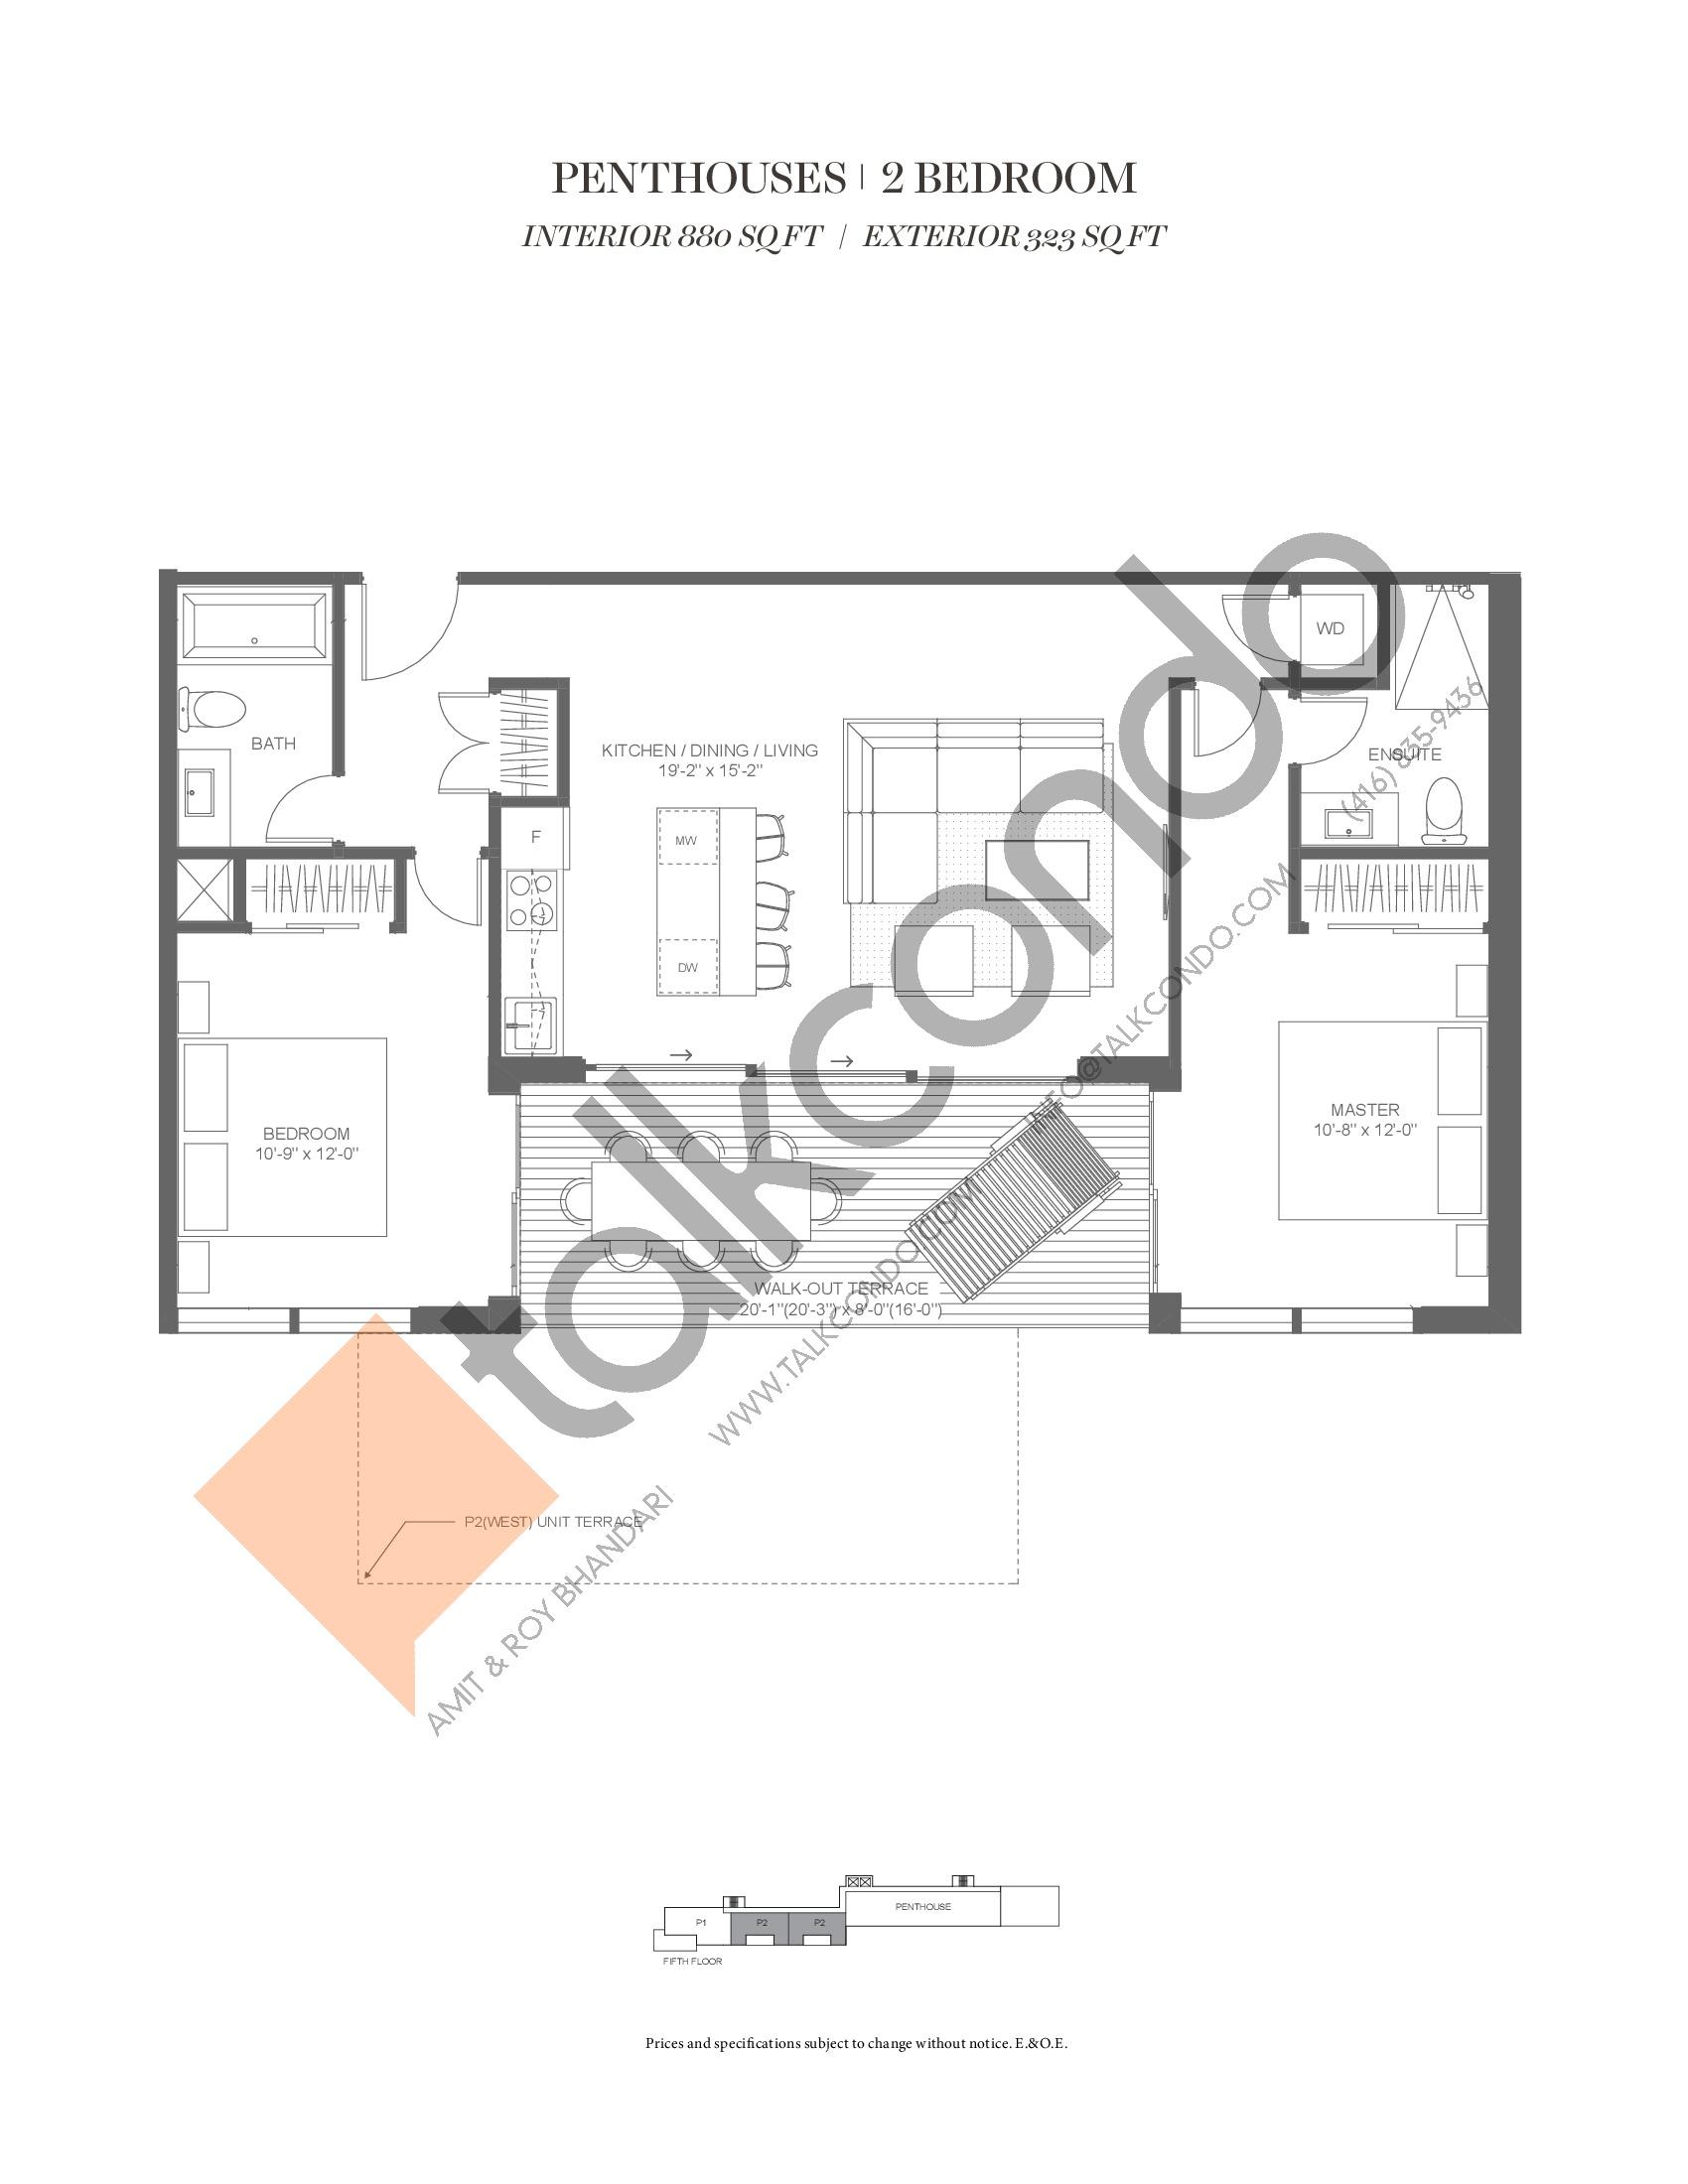 P3 (Penthouse Collection) Floor Plan at Muskoka Bay Resort - 880 sq.ft